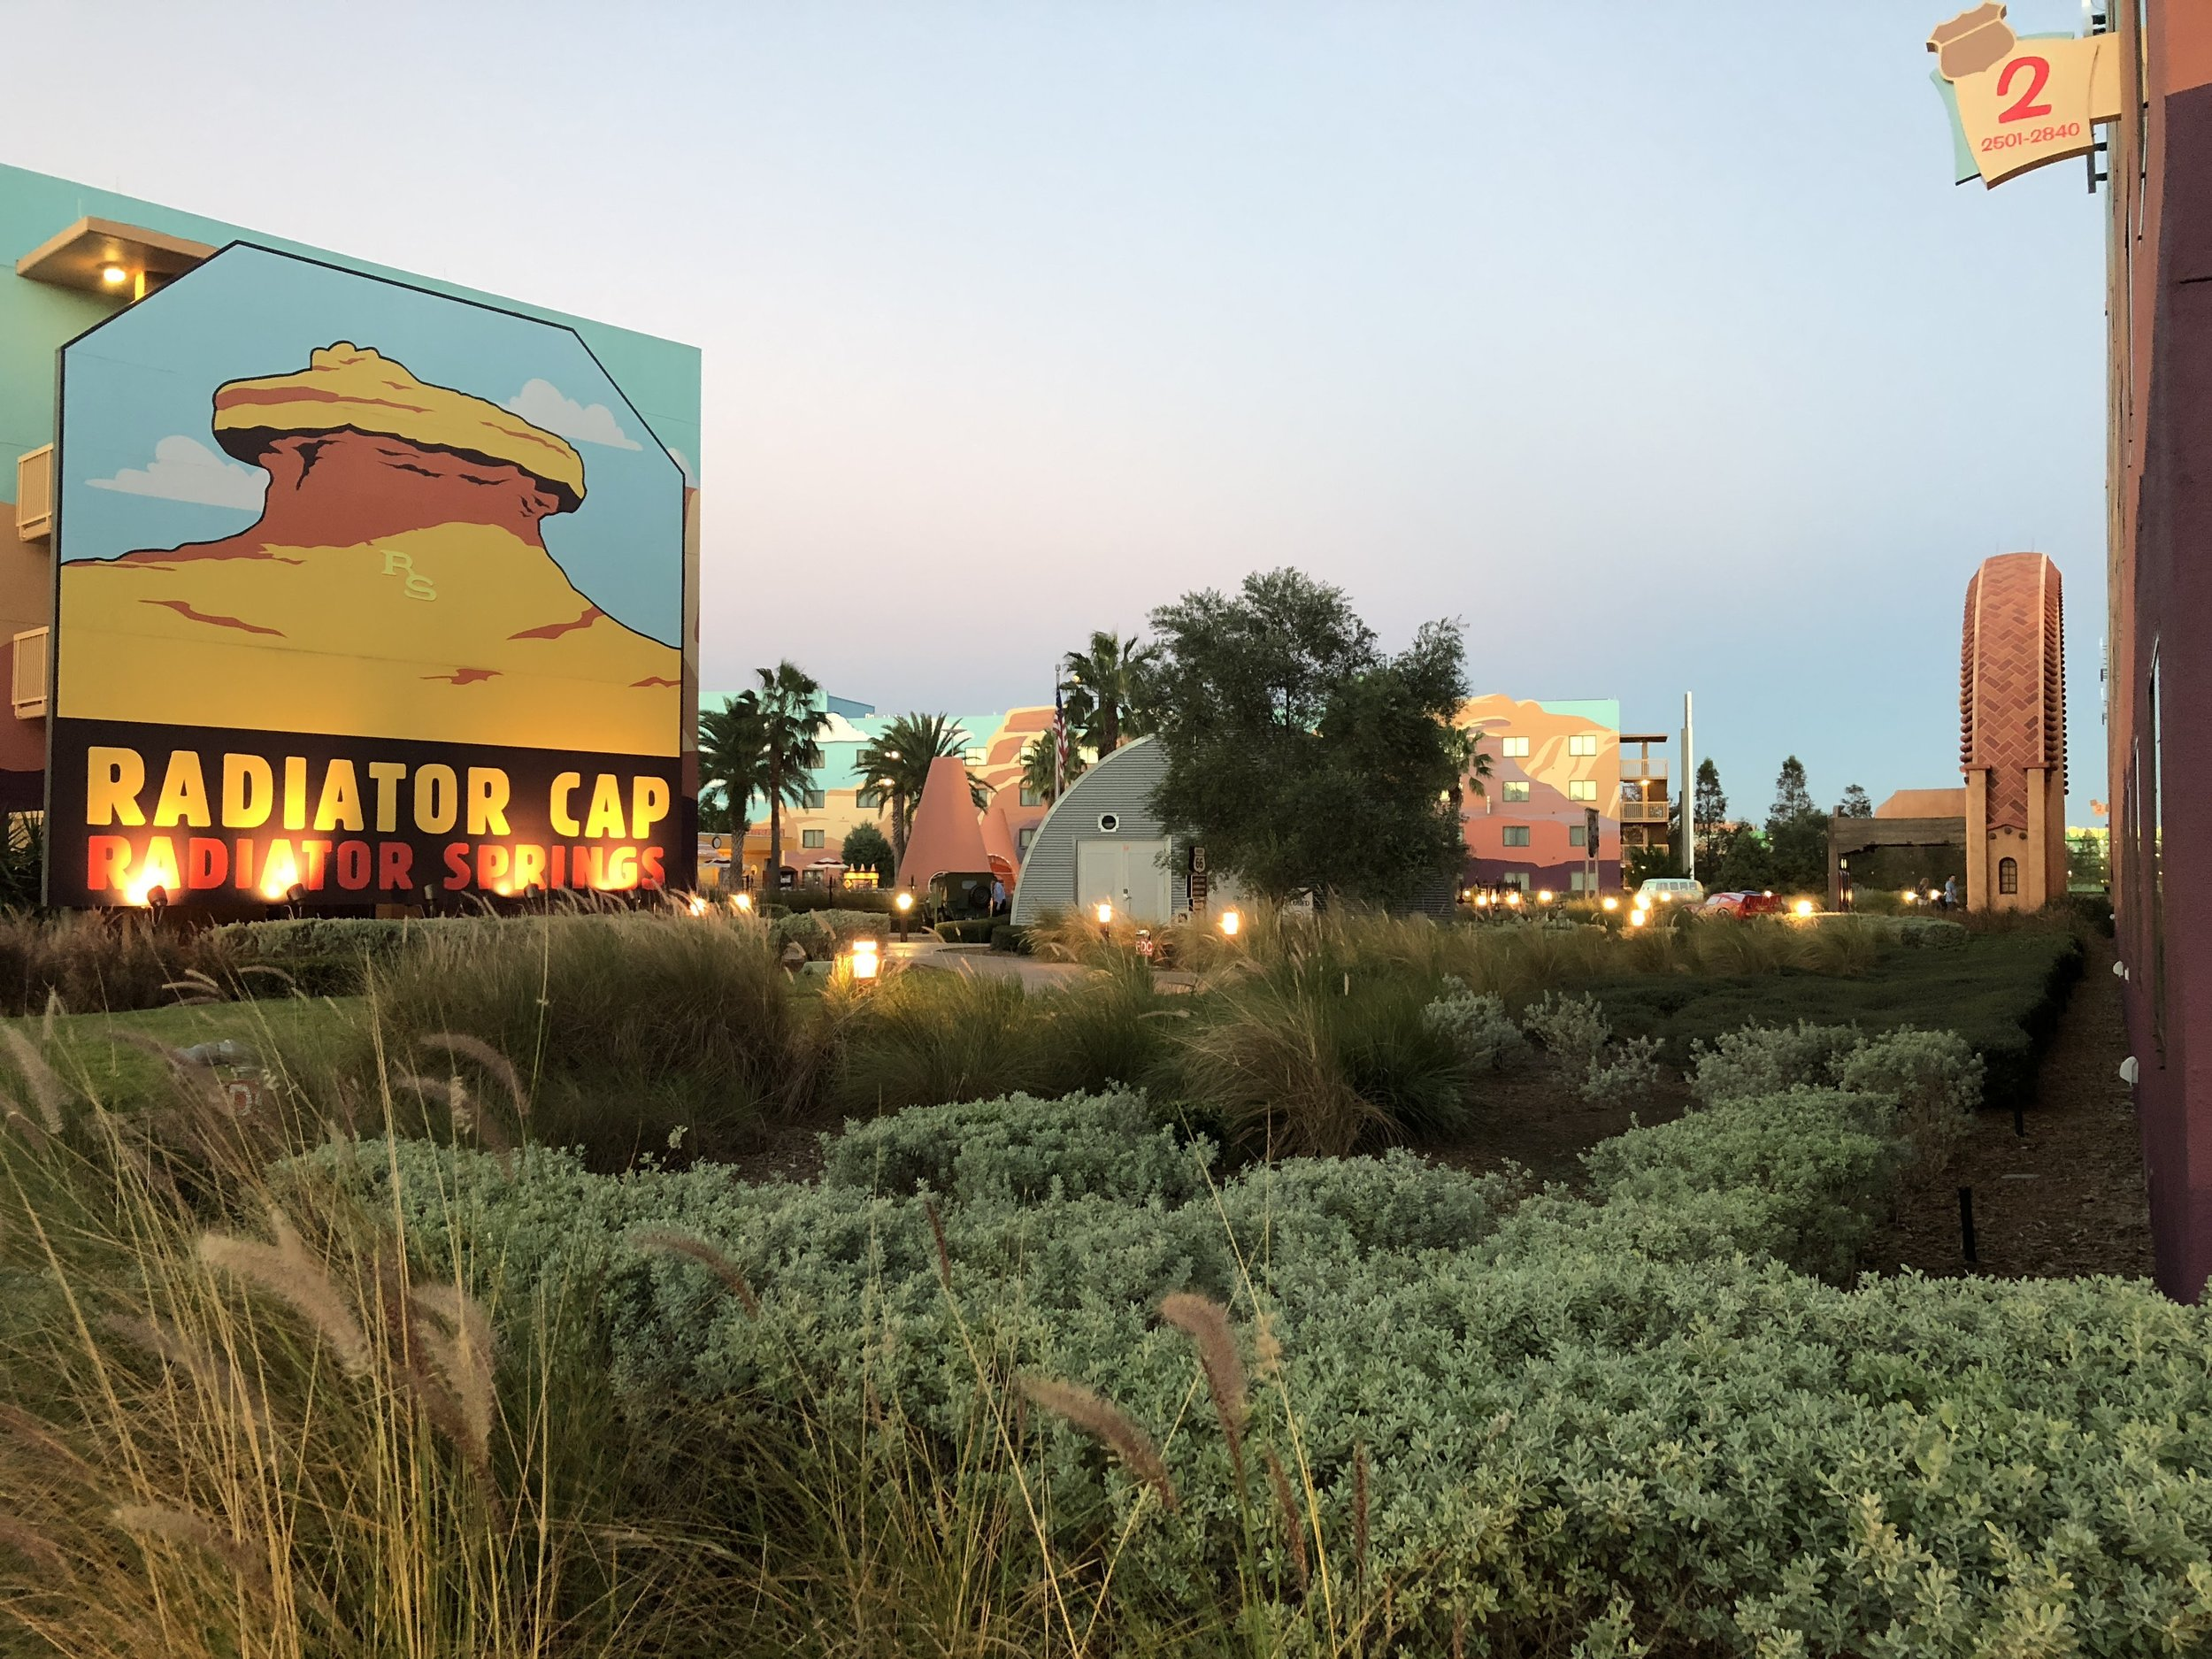 Welcome to radiator Springs (Art of Animation resort)